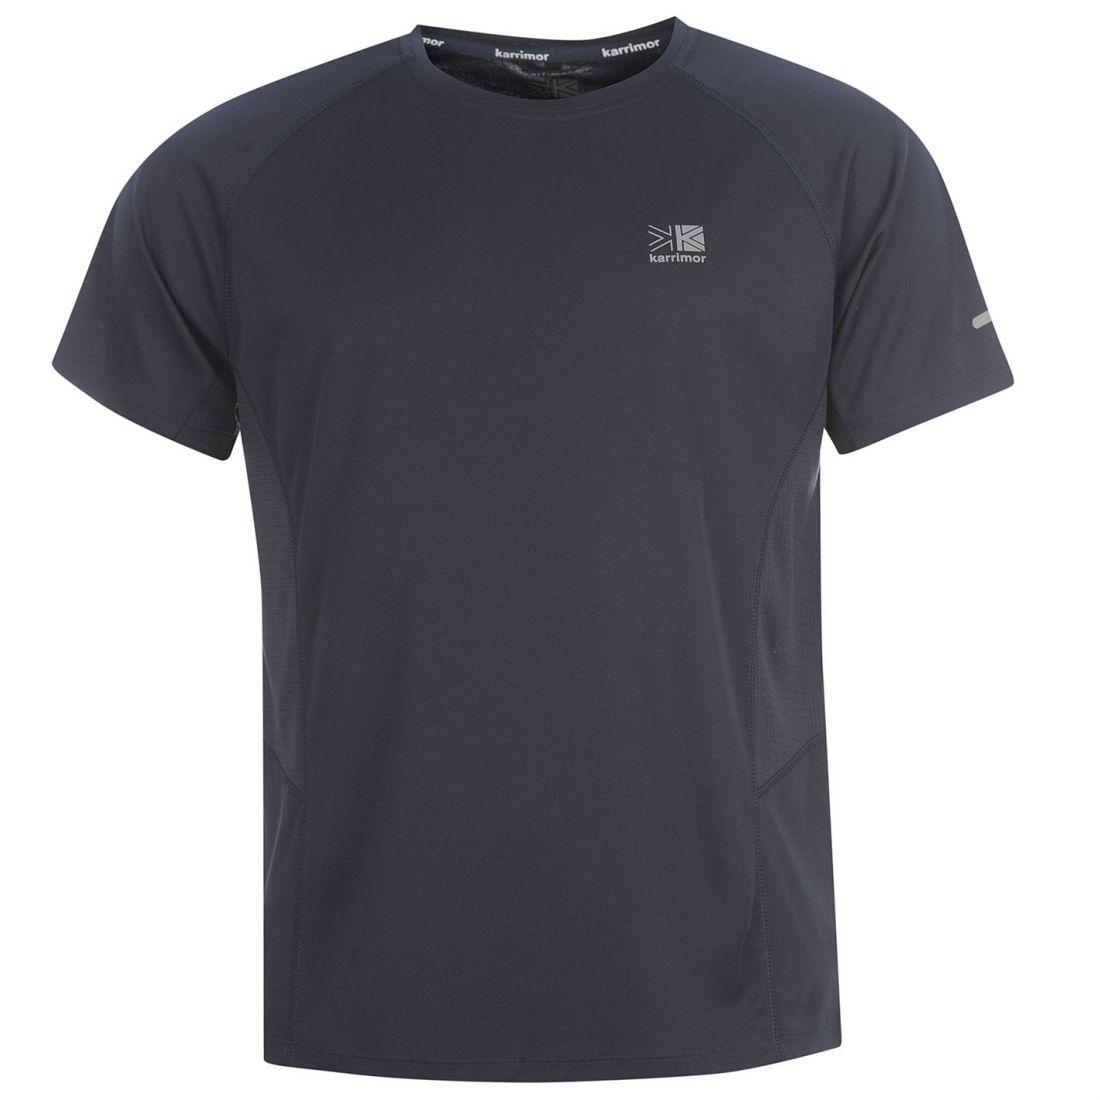 Karrimor Mens Short Sleeve Run T Shirt Breathable Running Jogging Sport Top